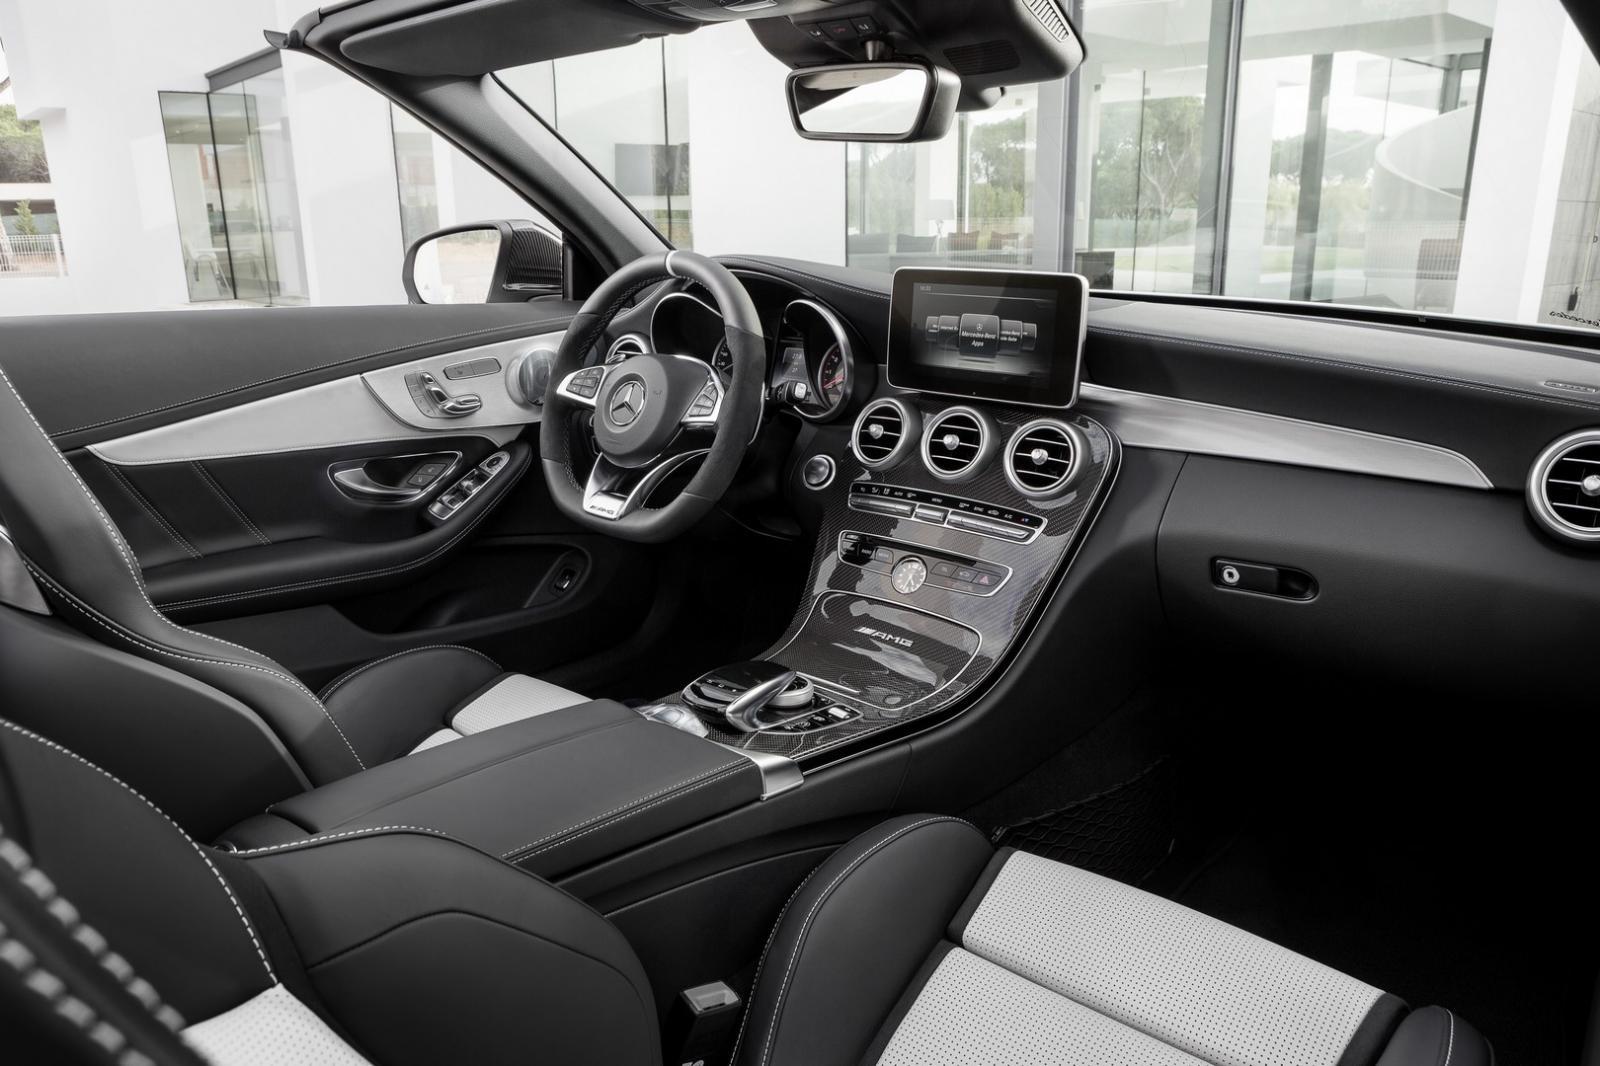 salon de new york mercedes d voile la c63 amg cabriolet. Black Bedroom Furniture Sets. Home Design Ideas